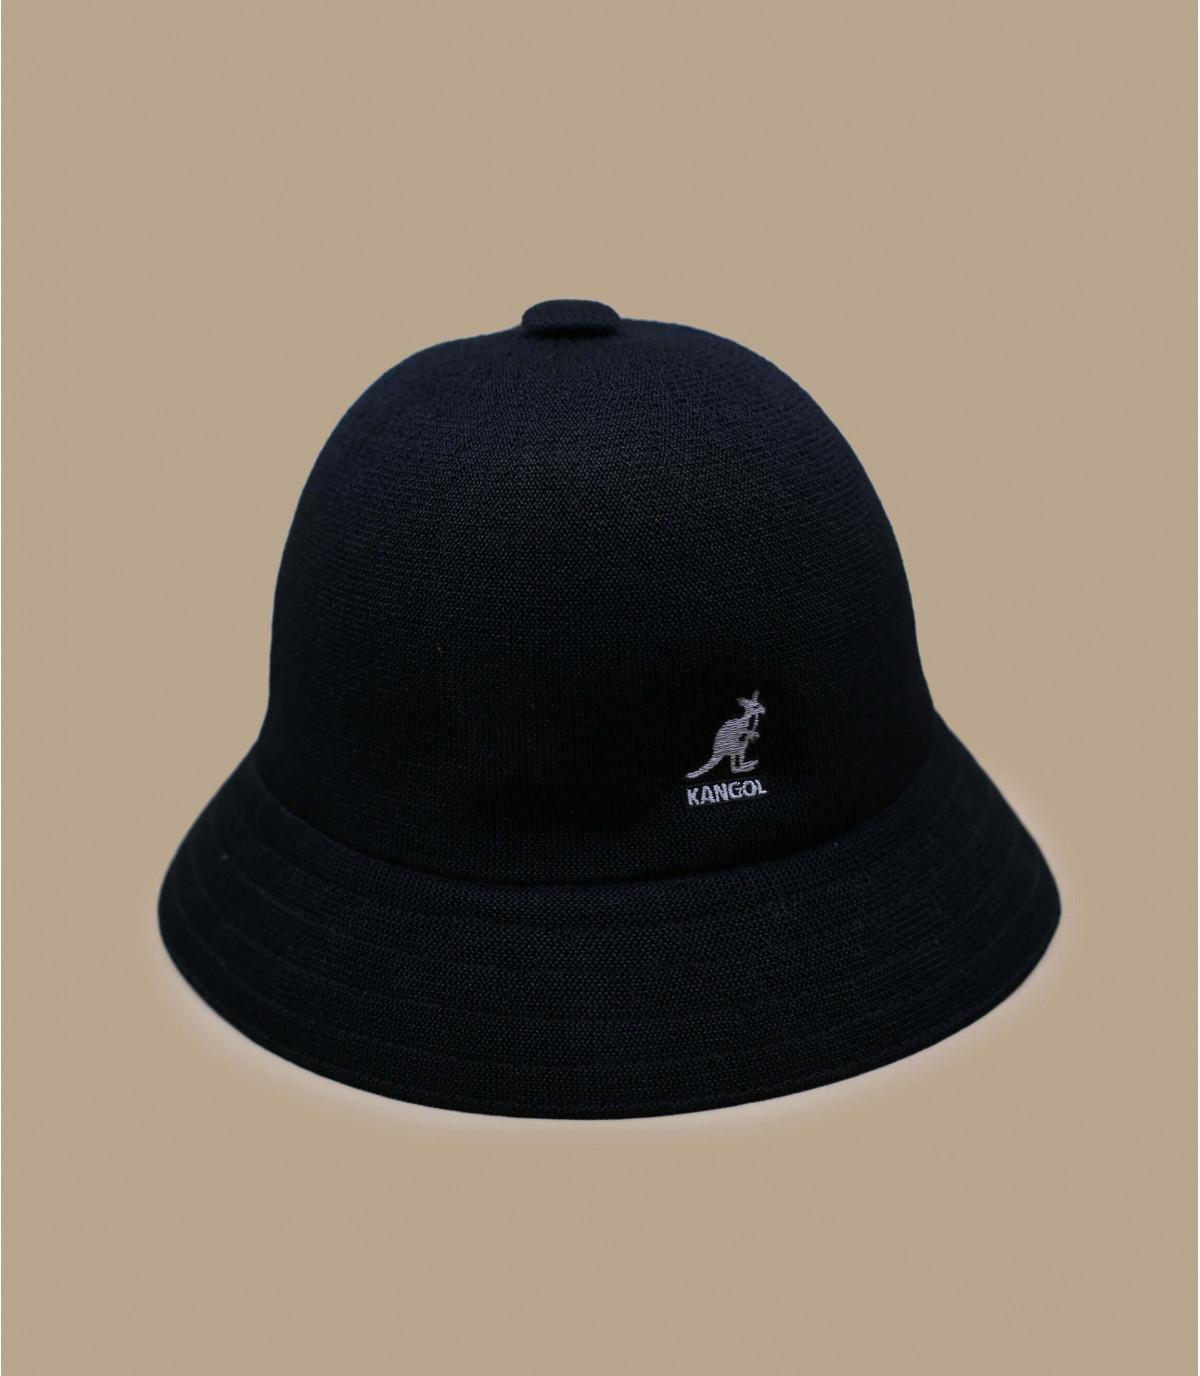 Kangol black Tropic bucket